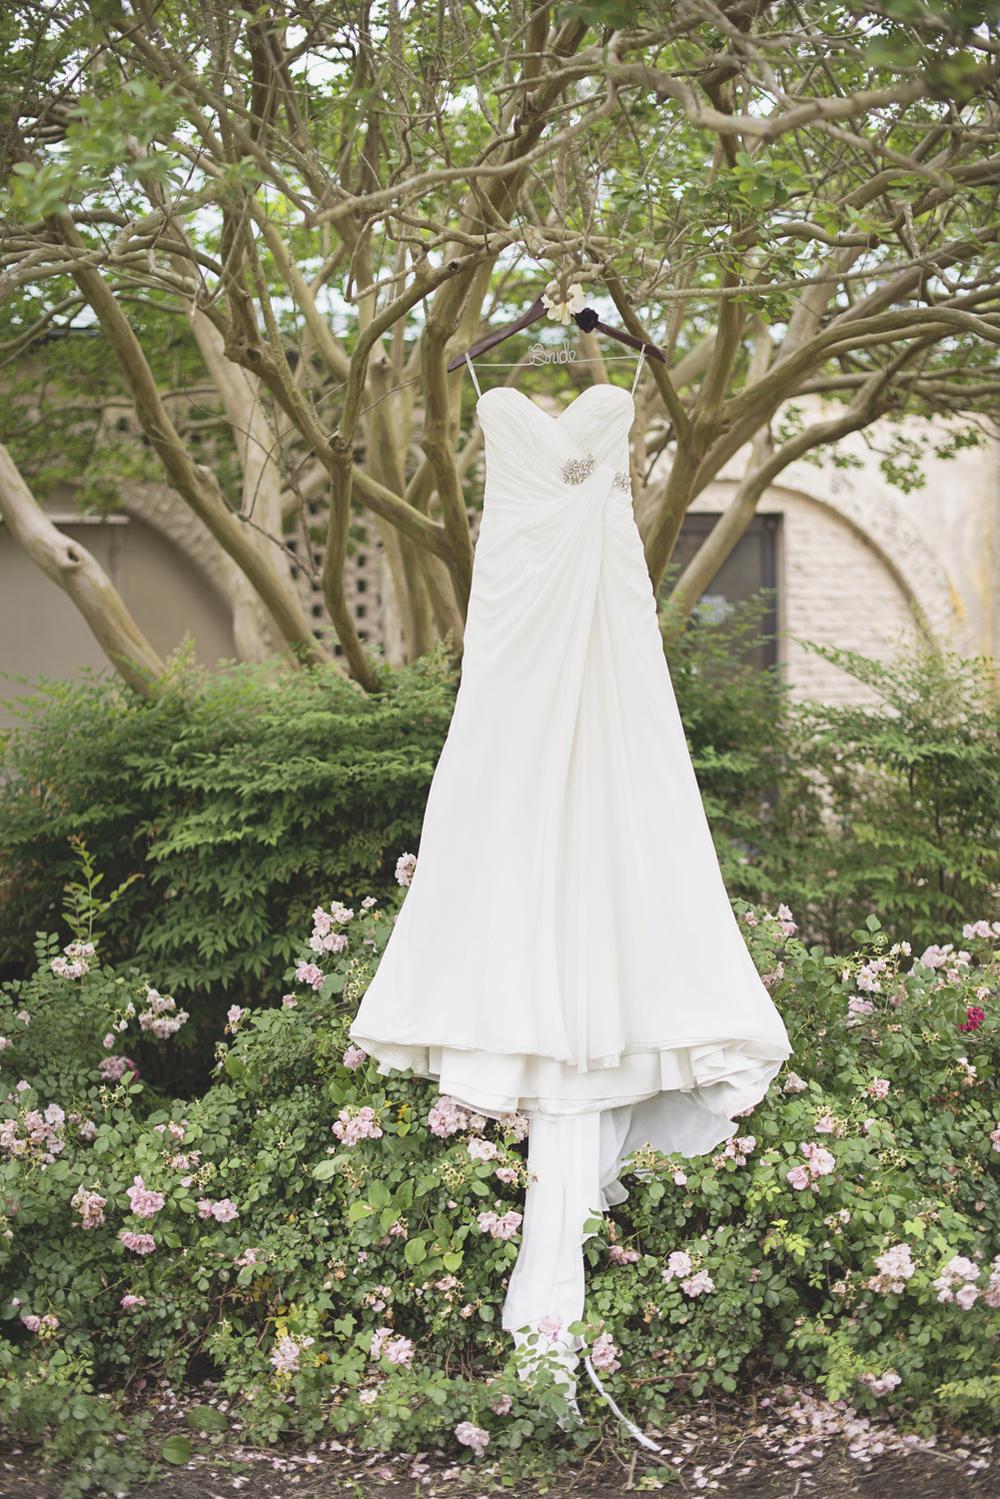 Mariners Museum Wedding | Newport News, Virginia | Wedding Dress